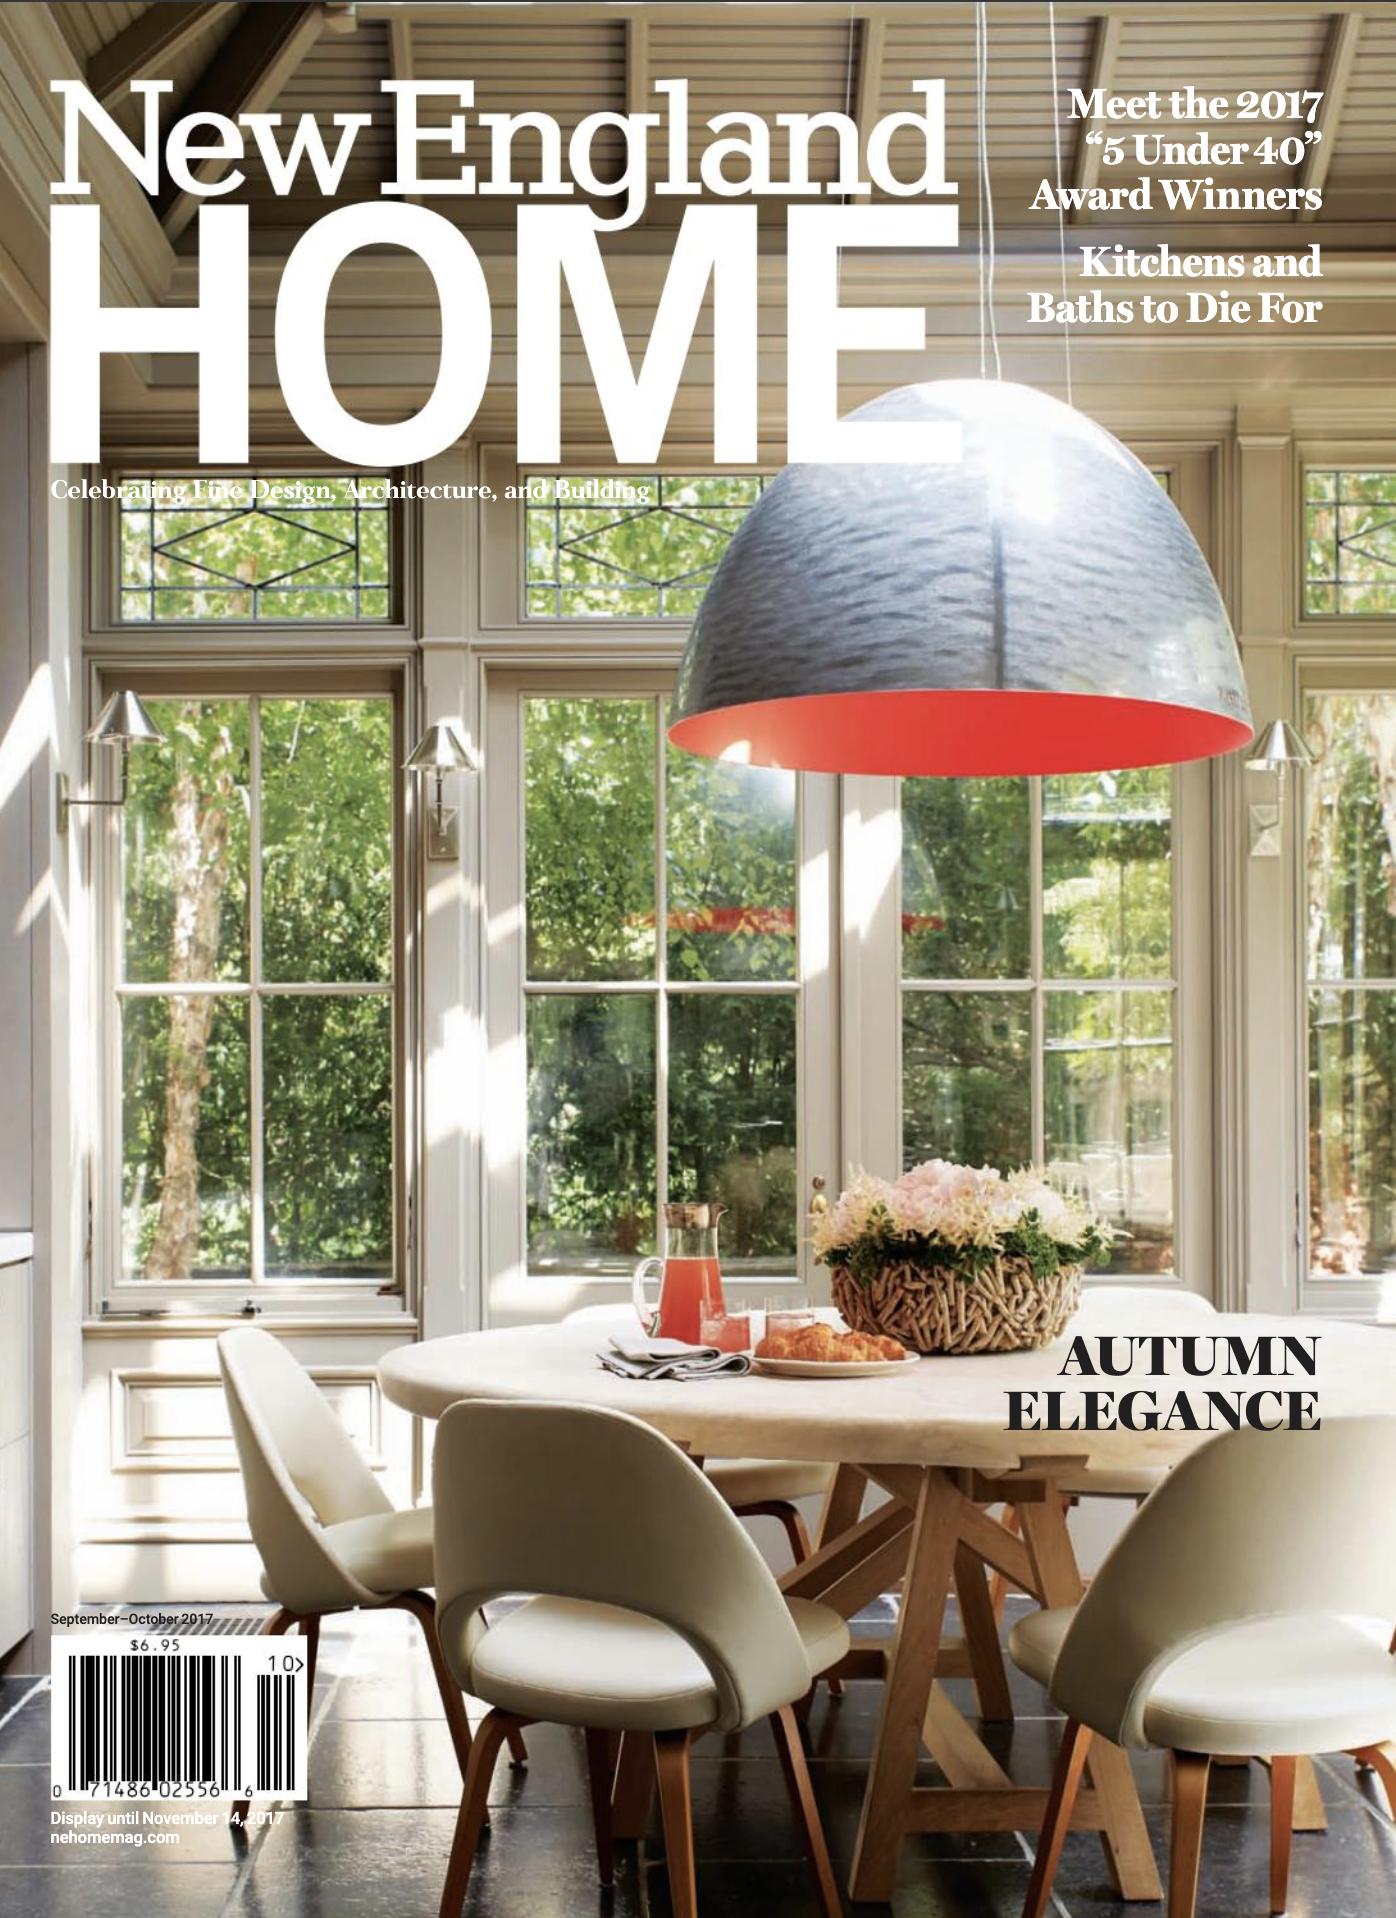 Anita Clark Design - New England Home Magazine, September/October 2017